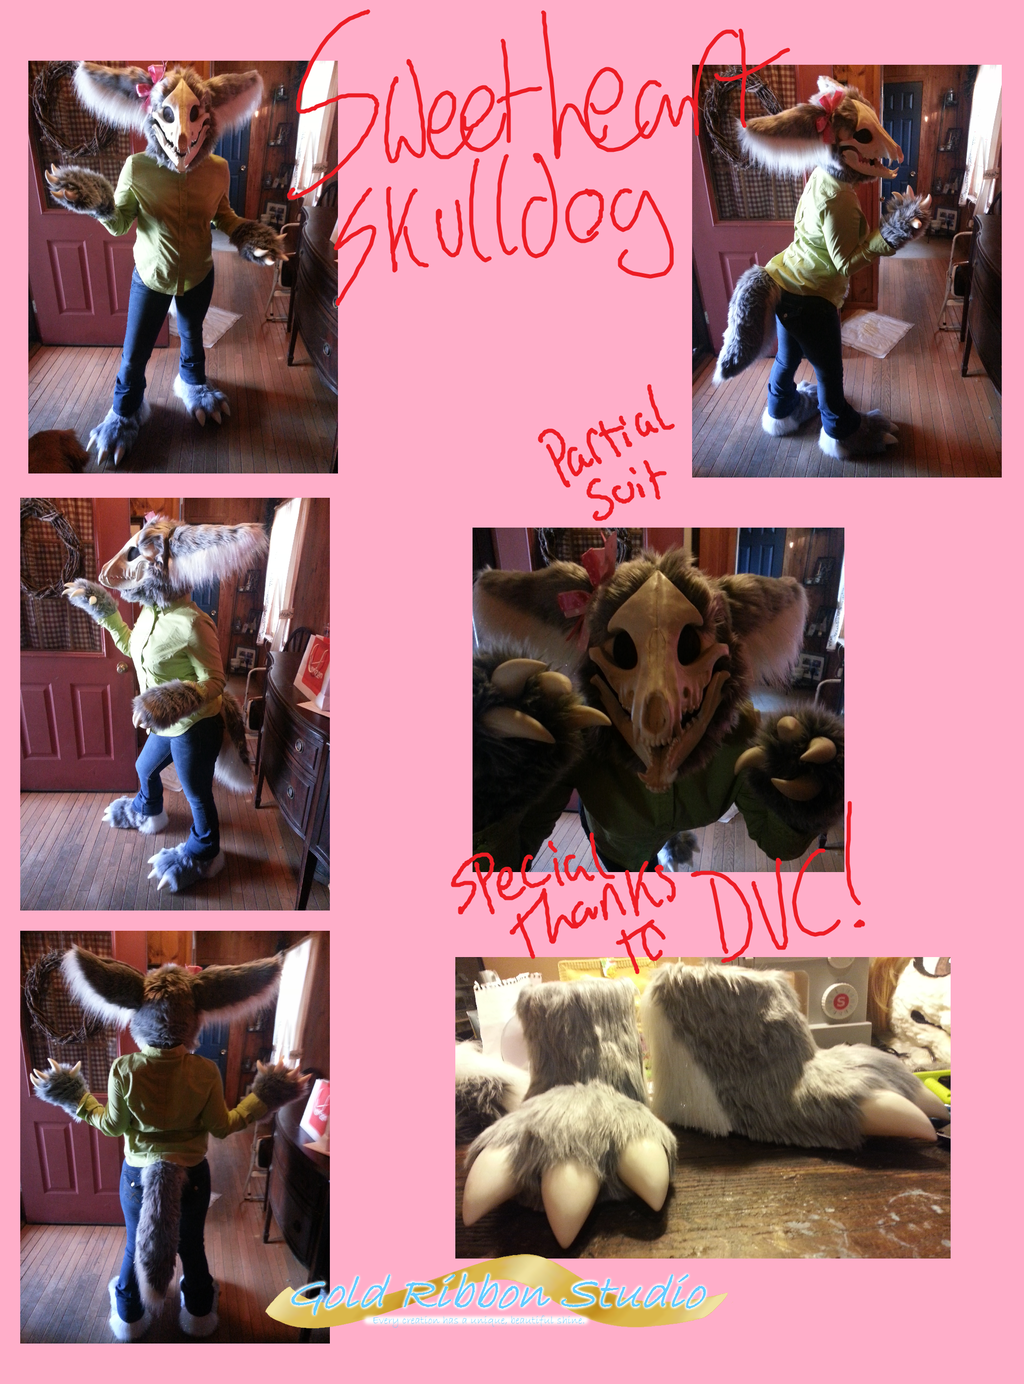 Featured image: Sweetheart Skulldog fursuit